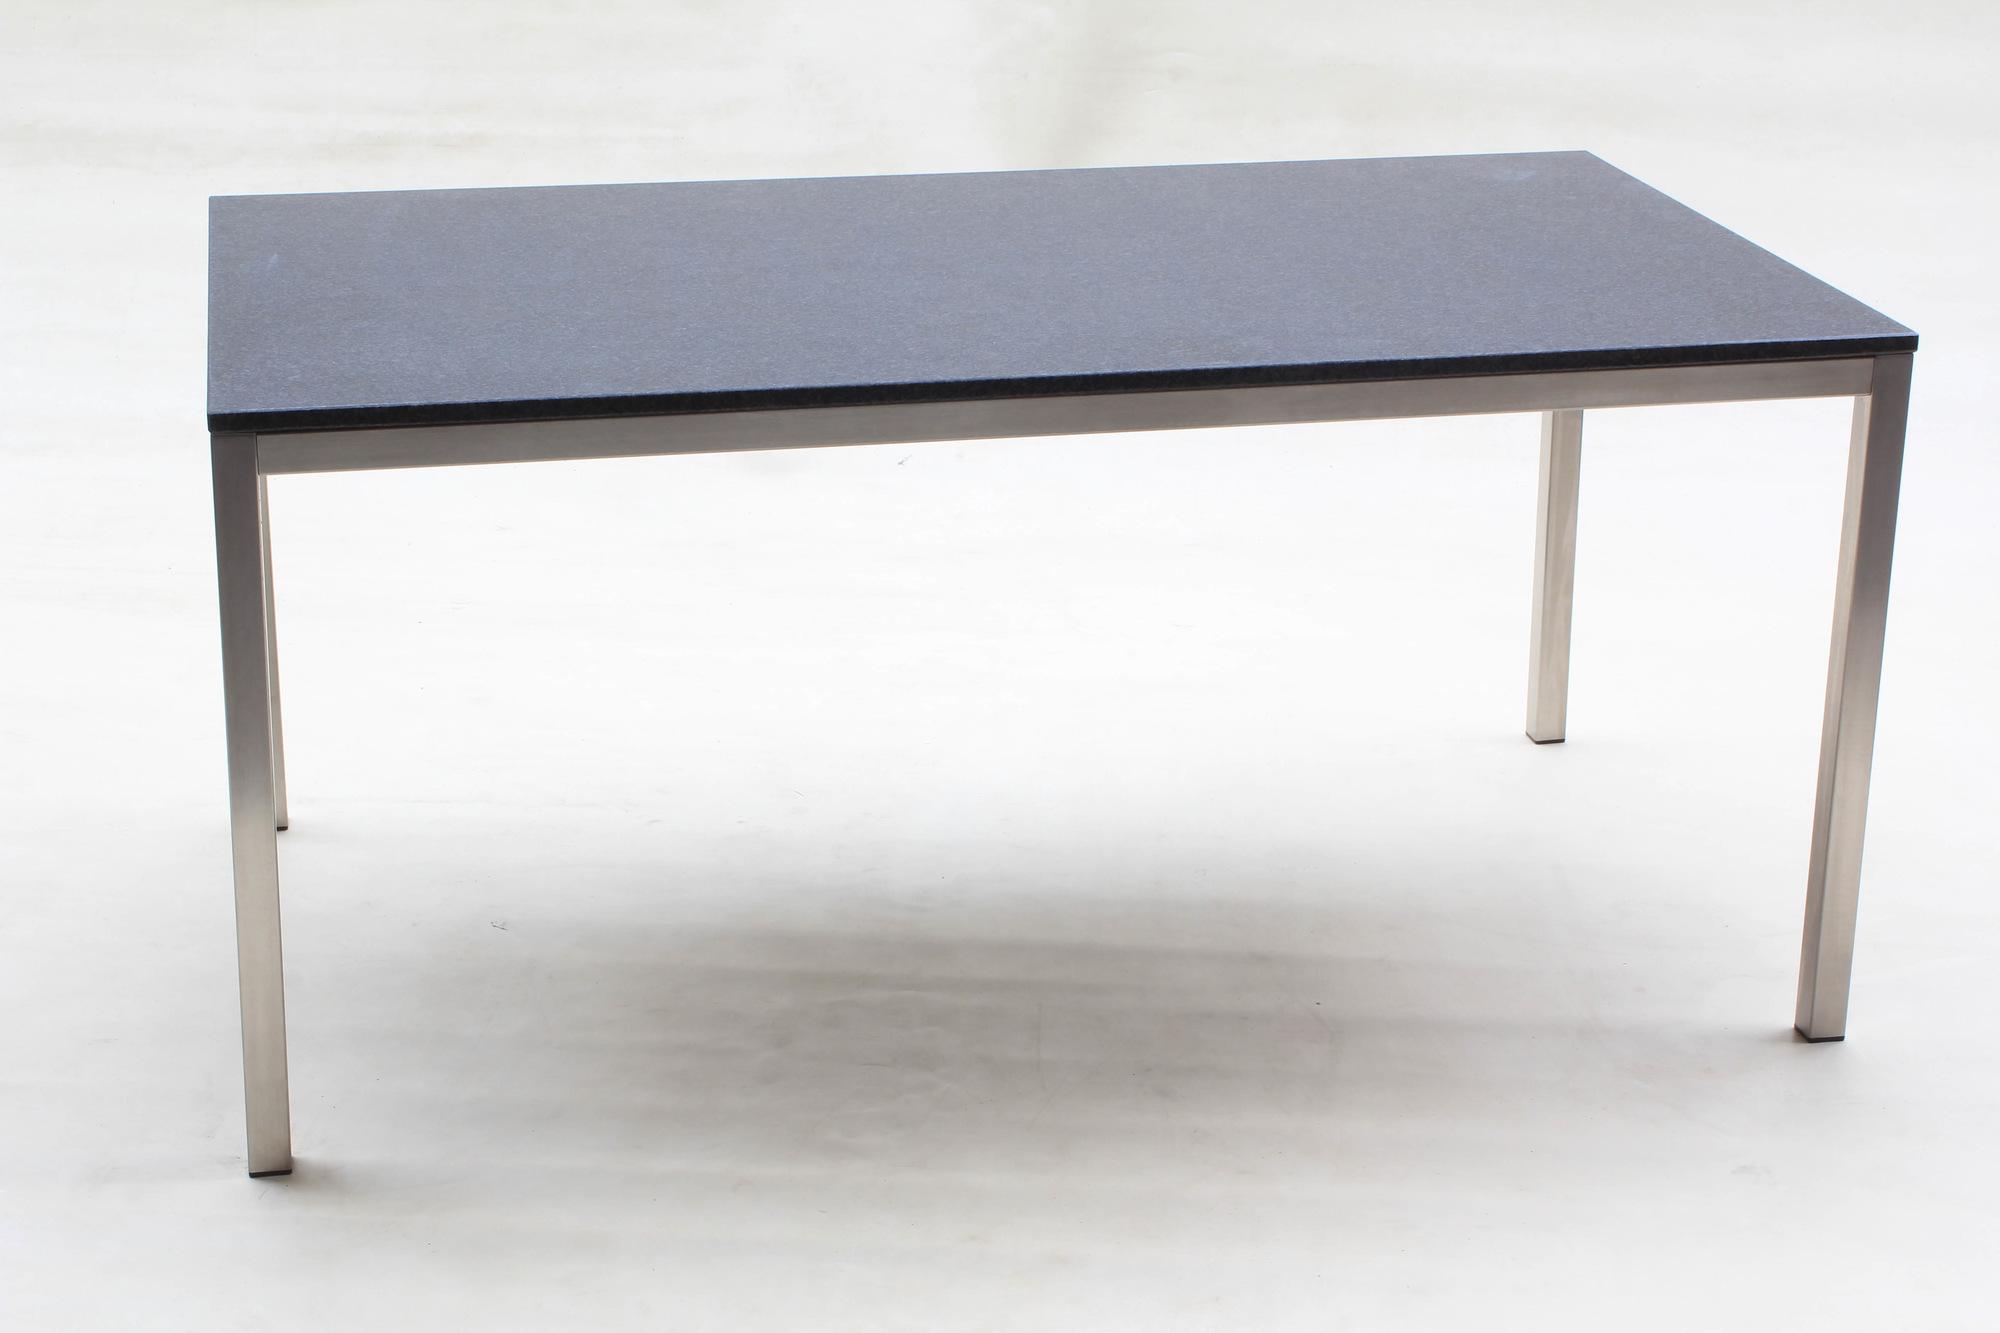 1540369678-gartenmoebel-185x85cm-edelstahl-granittisch-malta.jpg